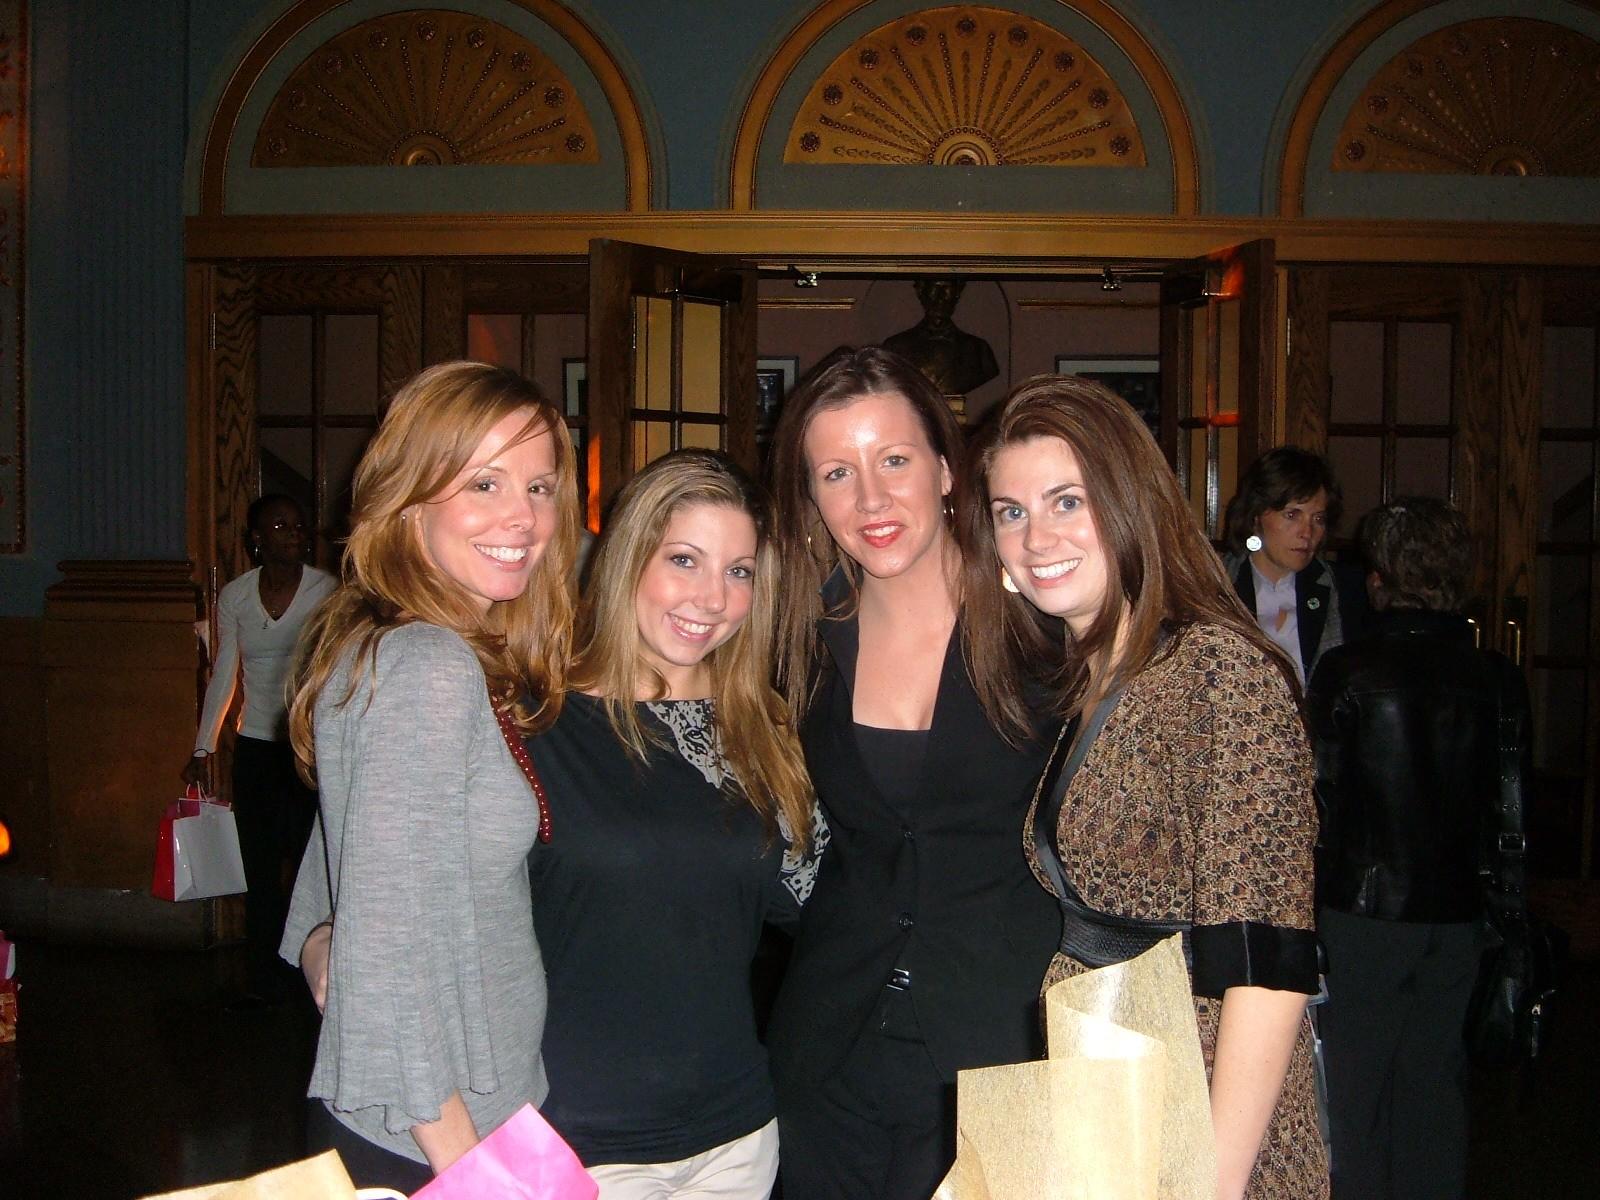 TCApr, Public Relations Washington DC, Marketing Washington DC, VDAY, Star Jones, Sherrie Shepherd